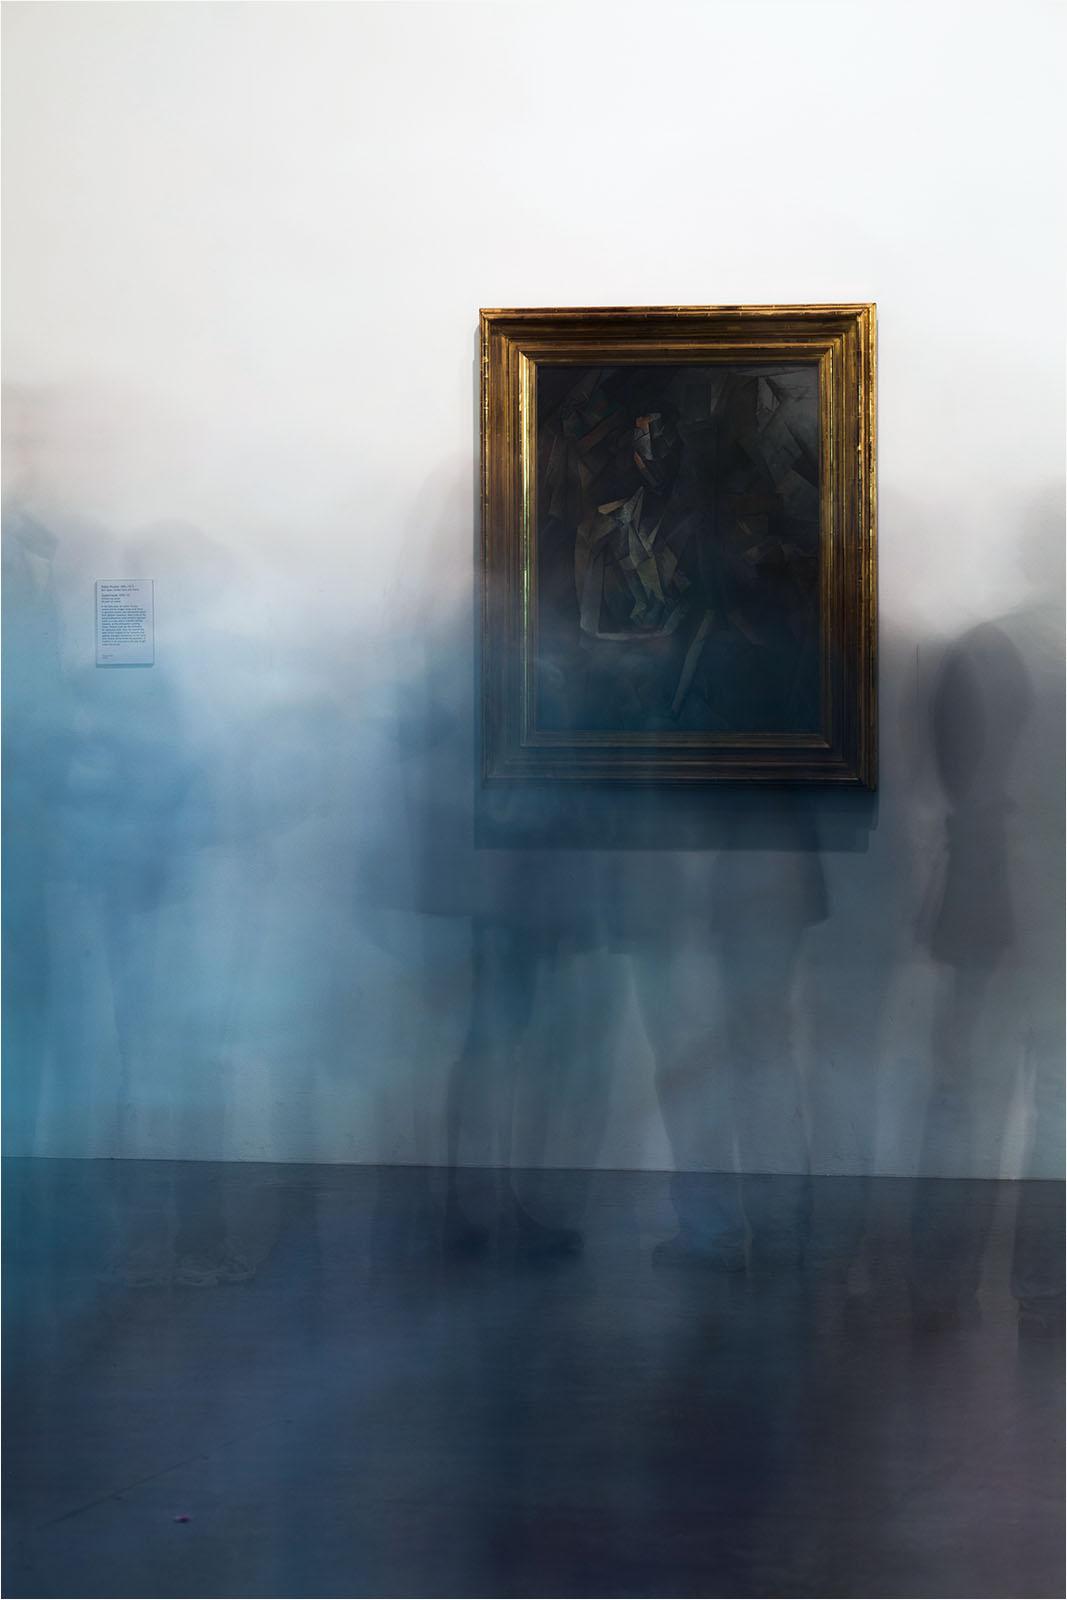 Picasso, Tate Modern, London (2012)